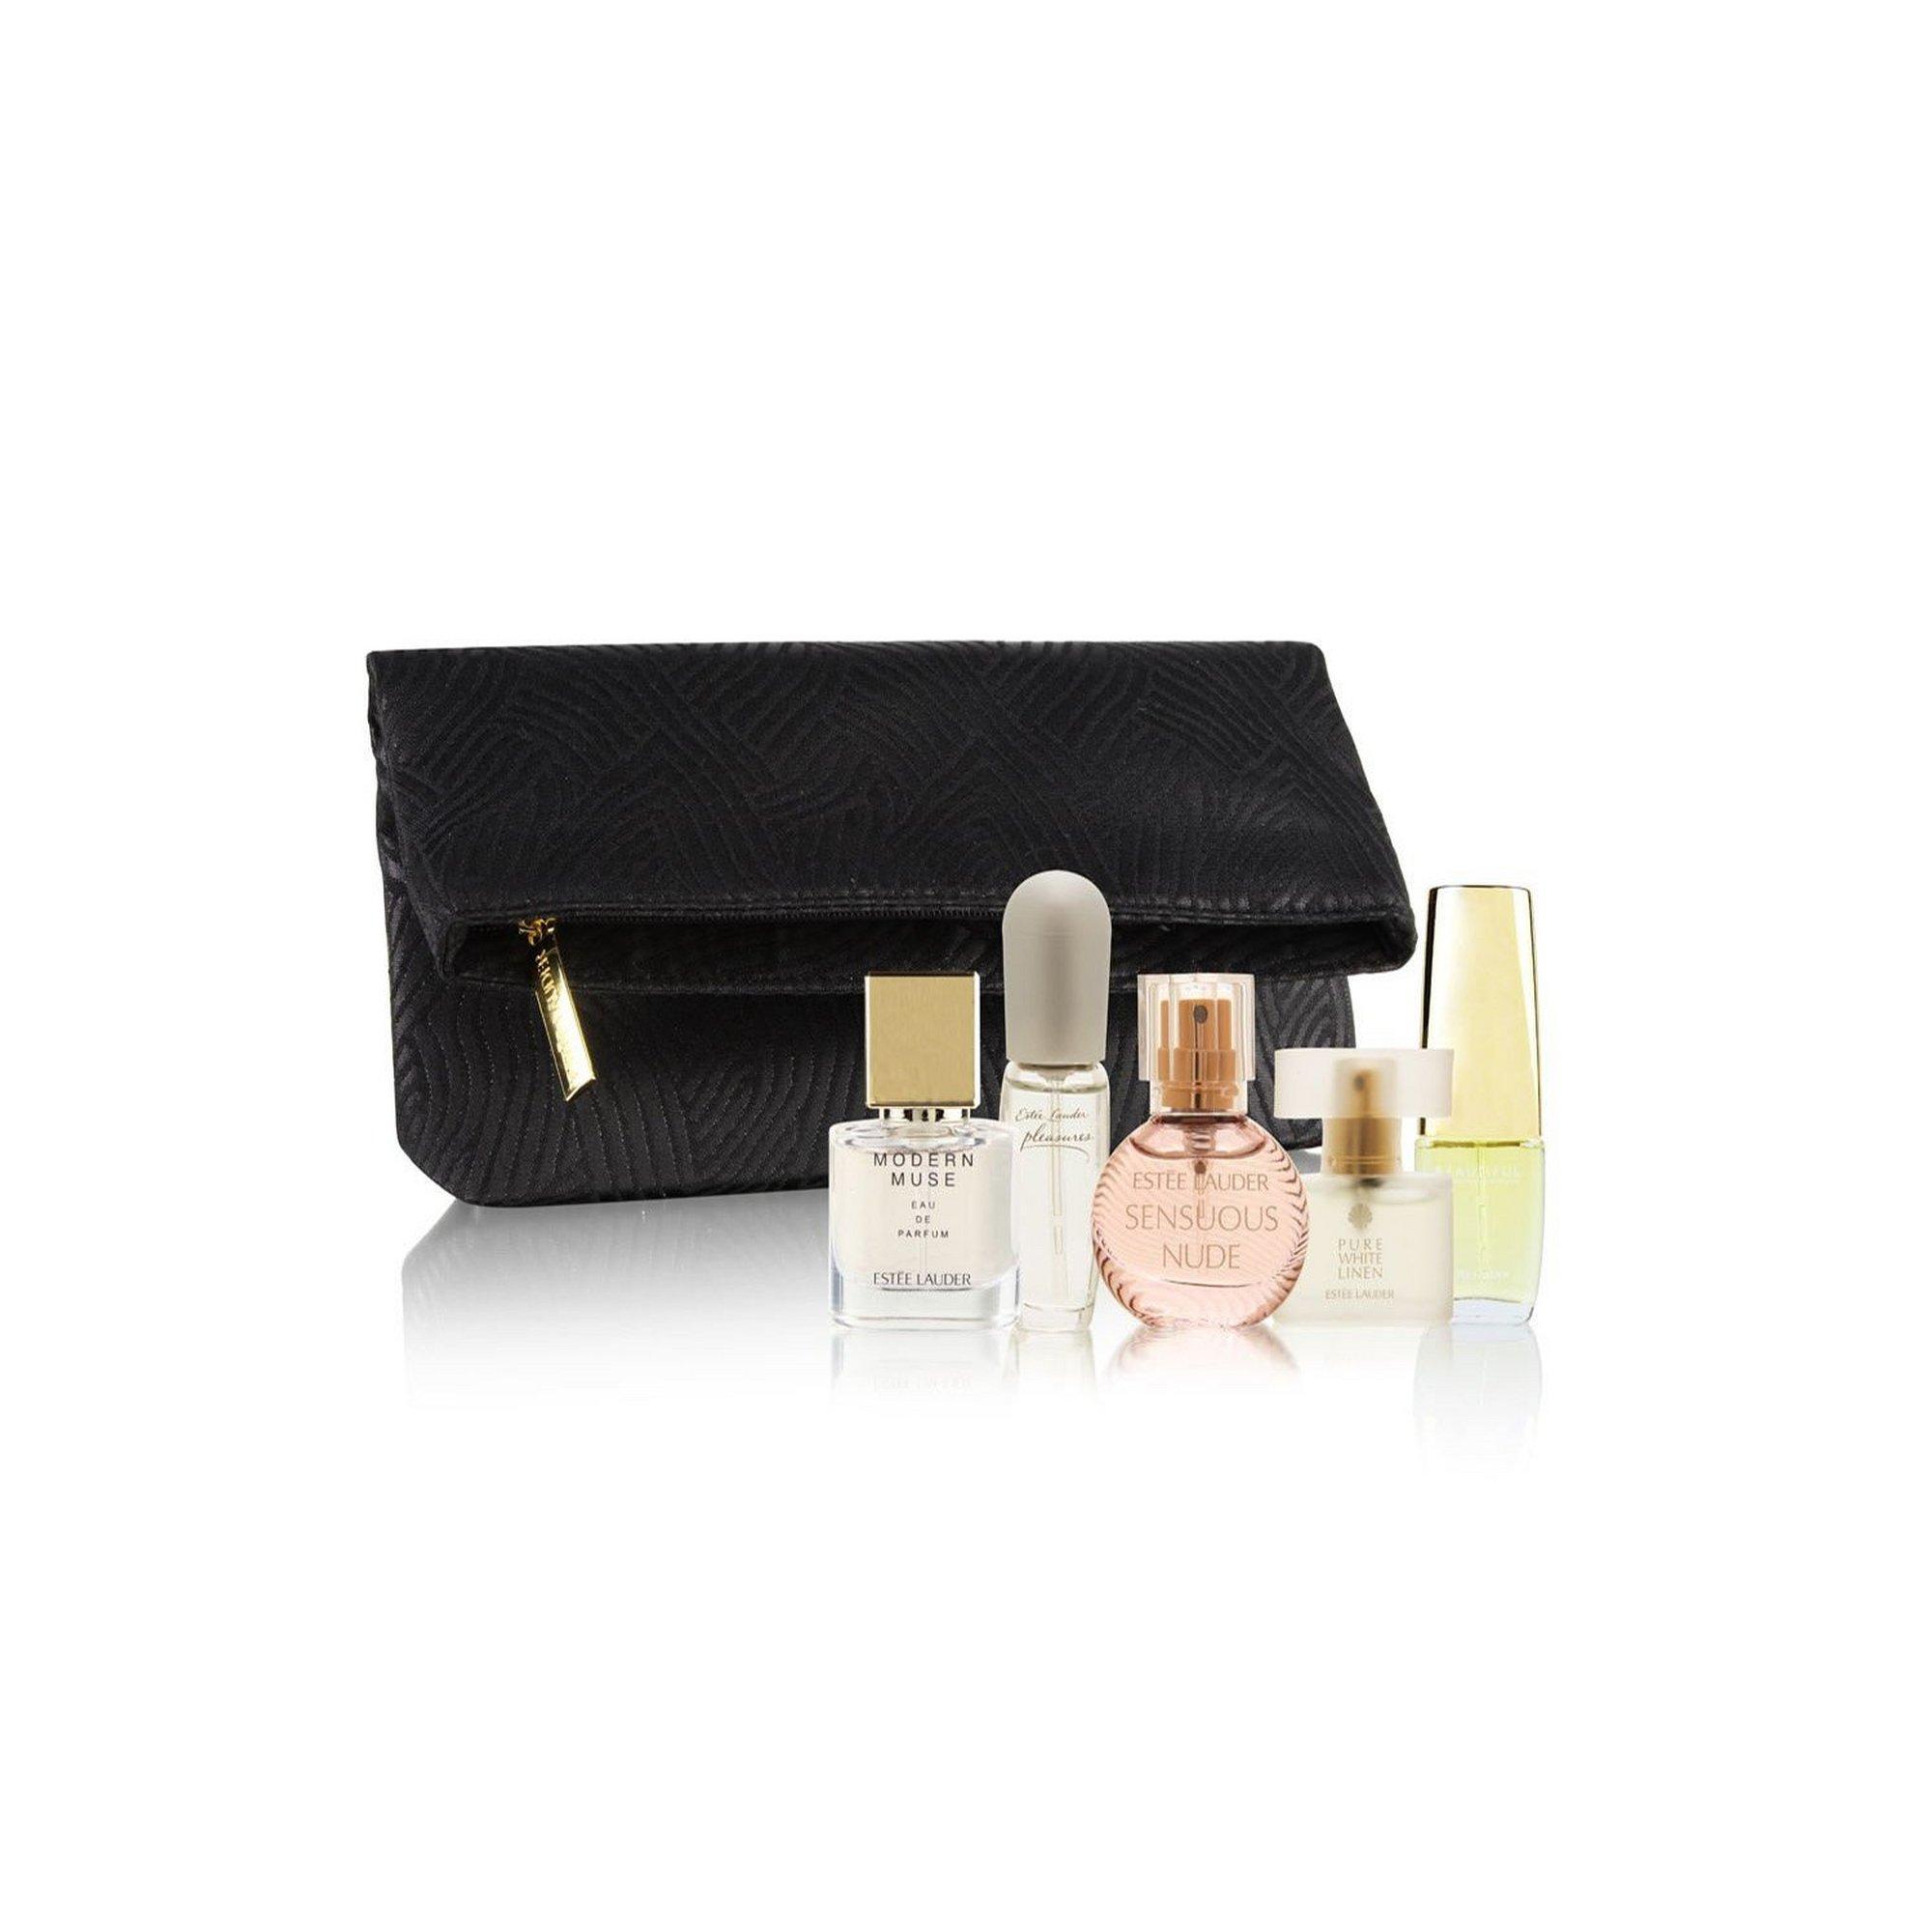 Image of Estee Lauder Miniature Fragrance Collection